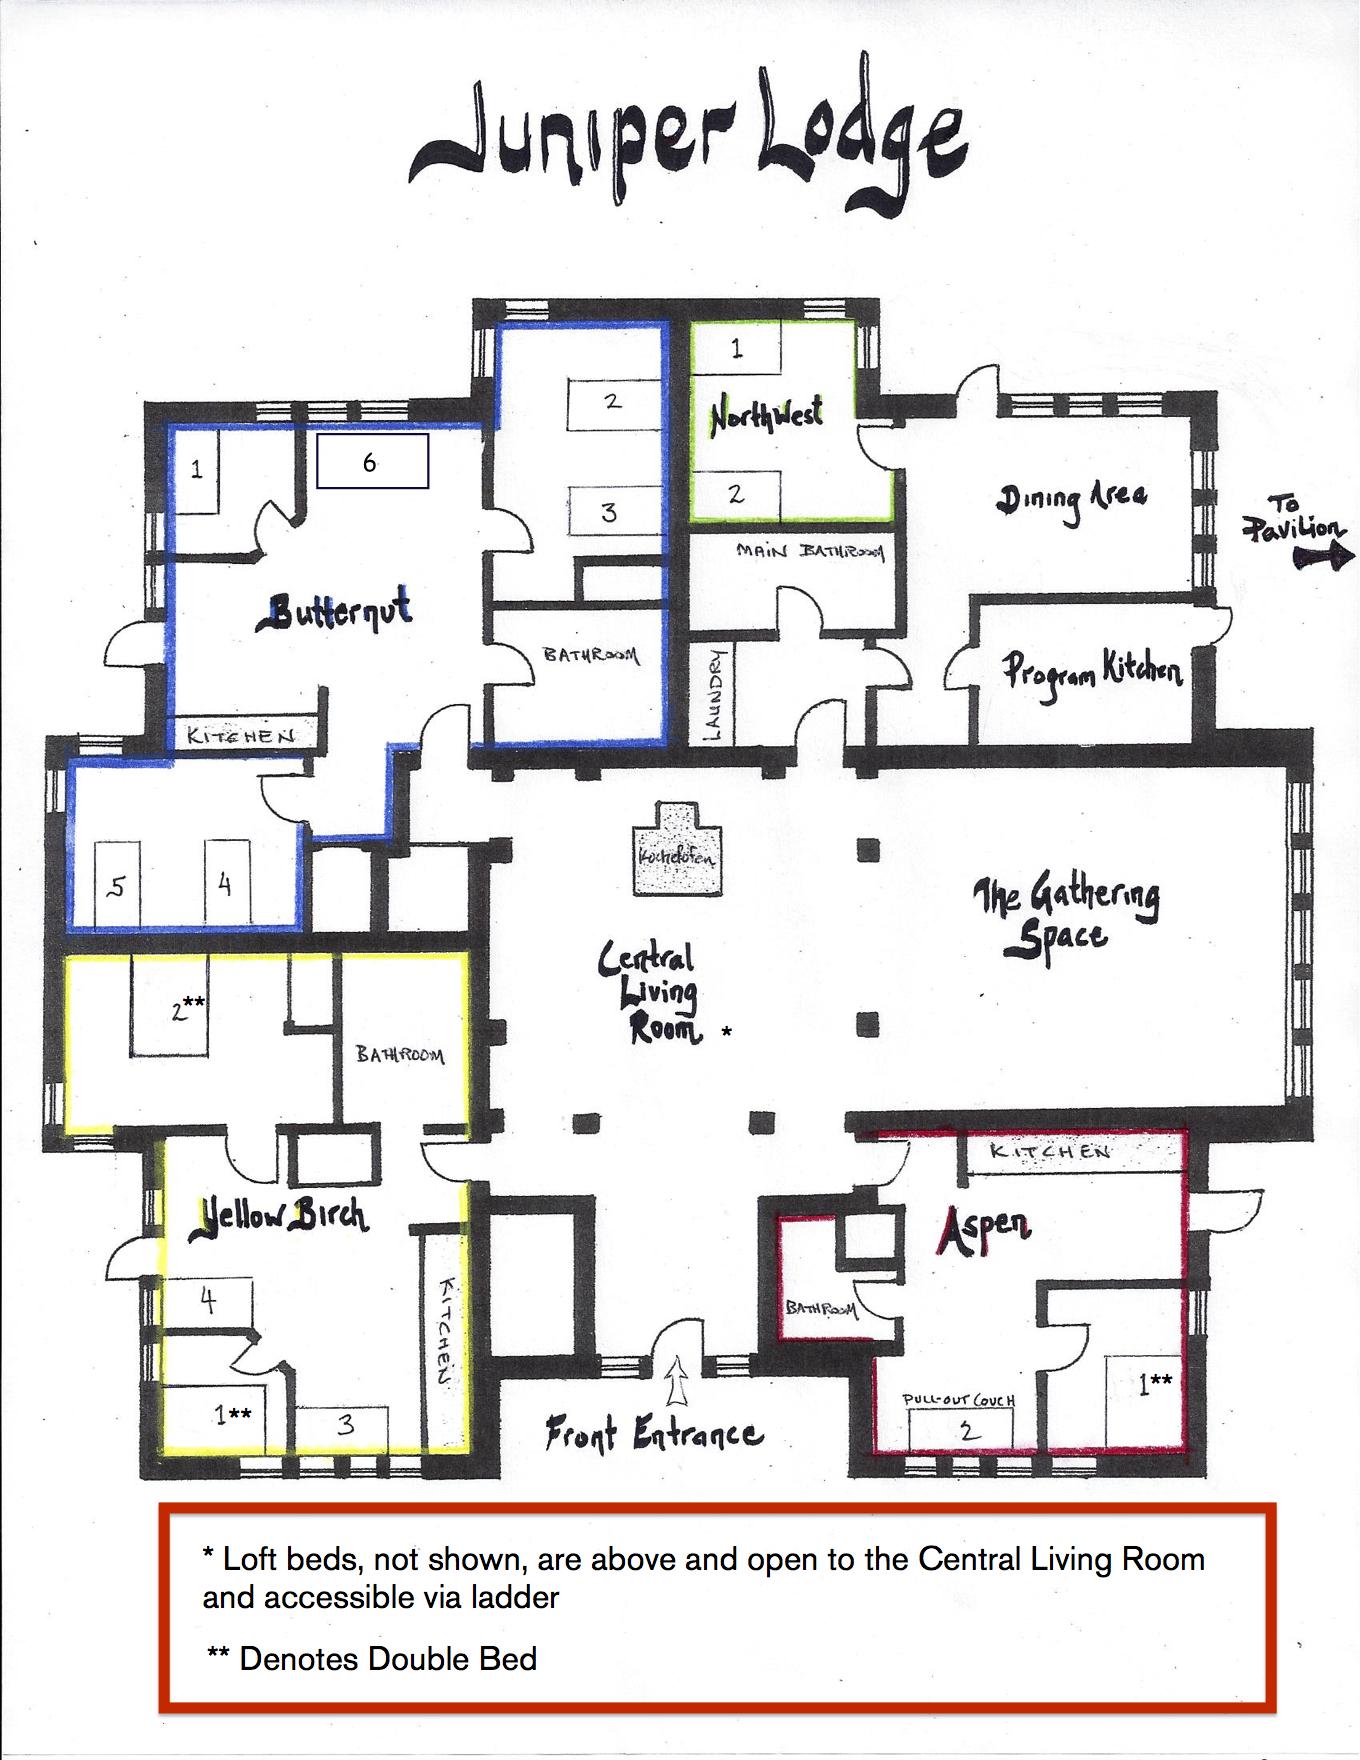 Juniper Lodge floor plan with notes 1.jpg